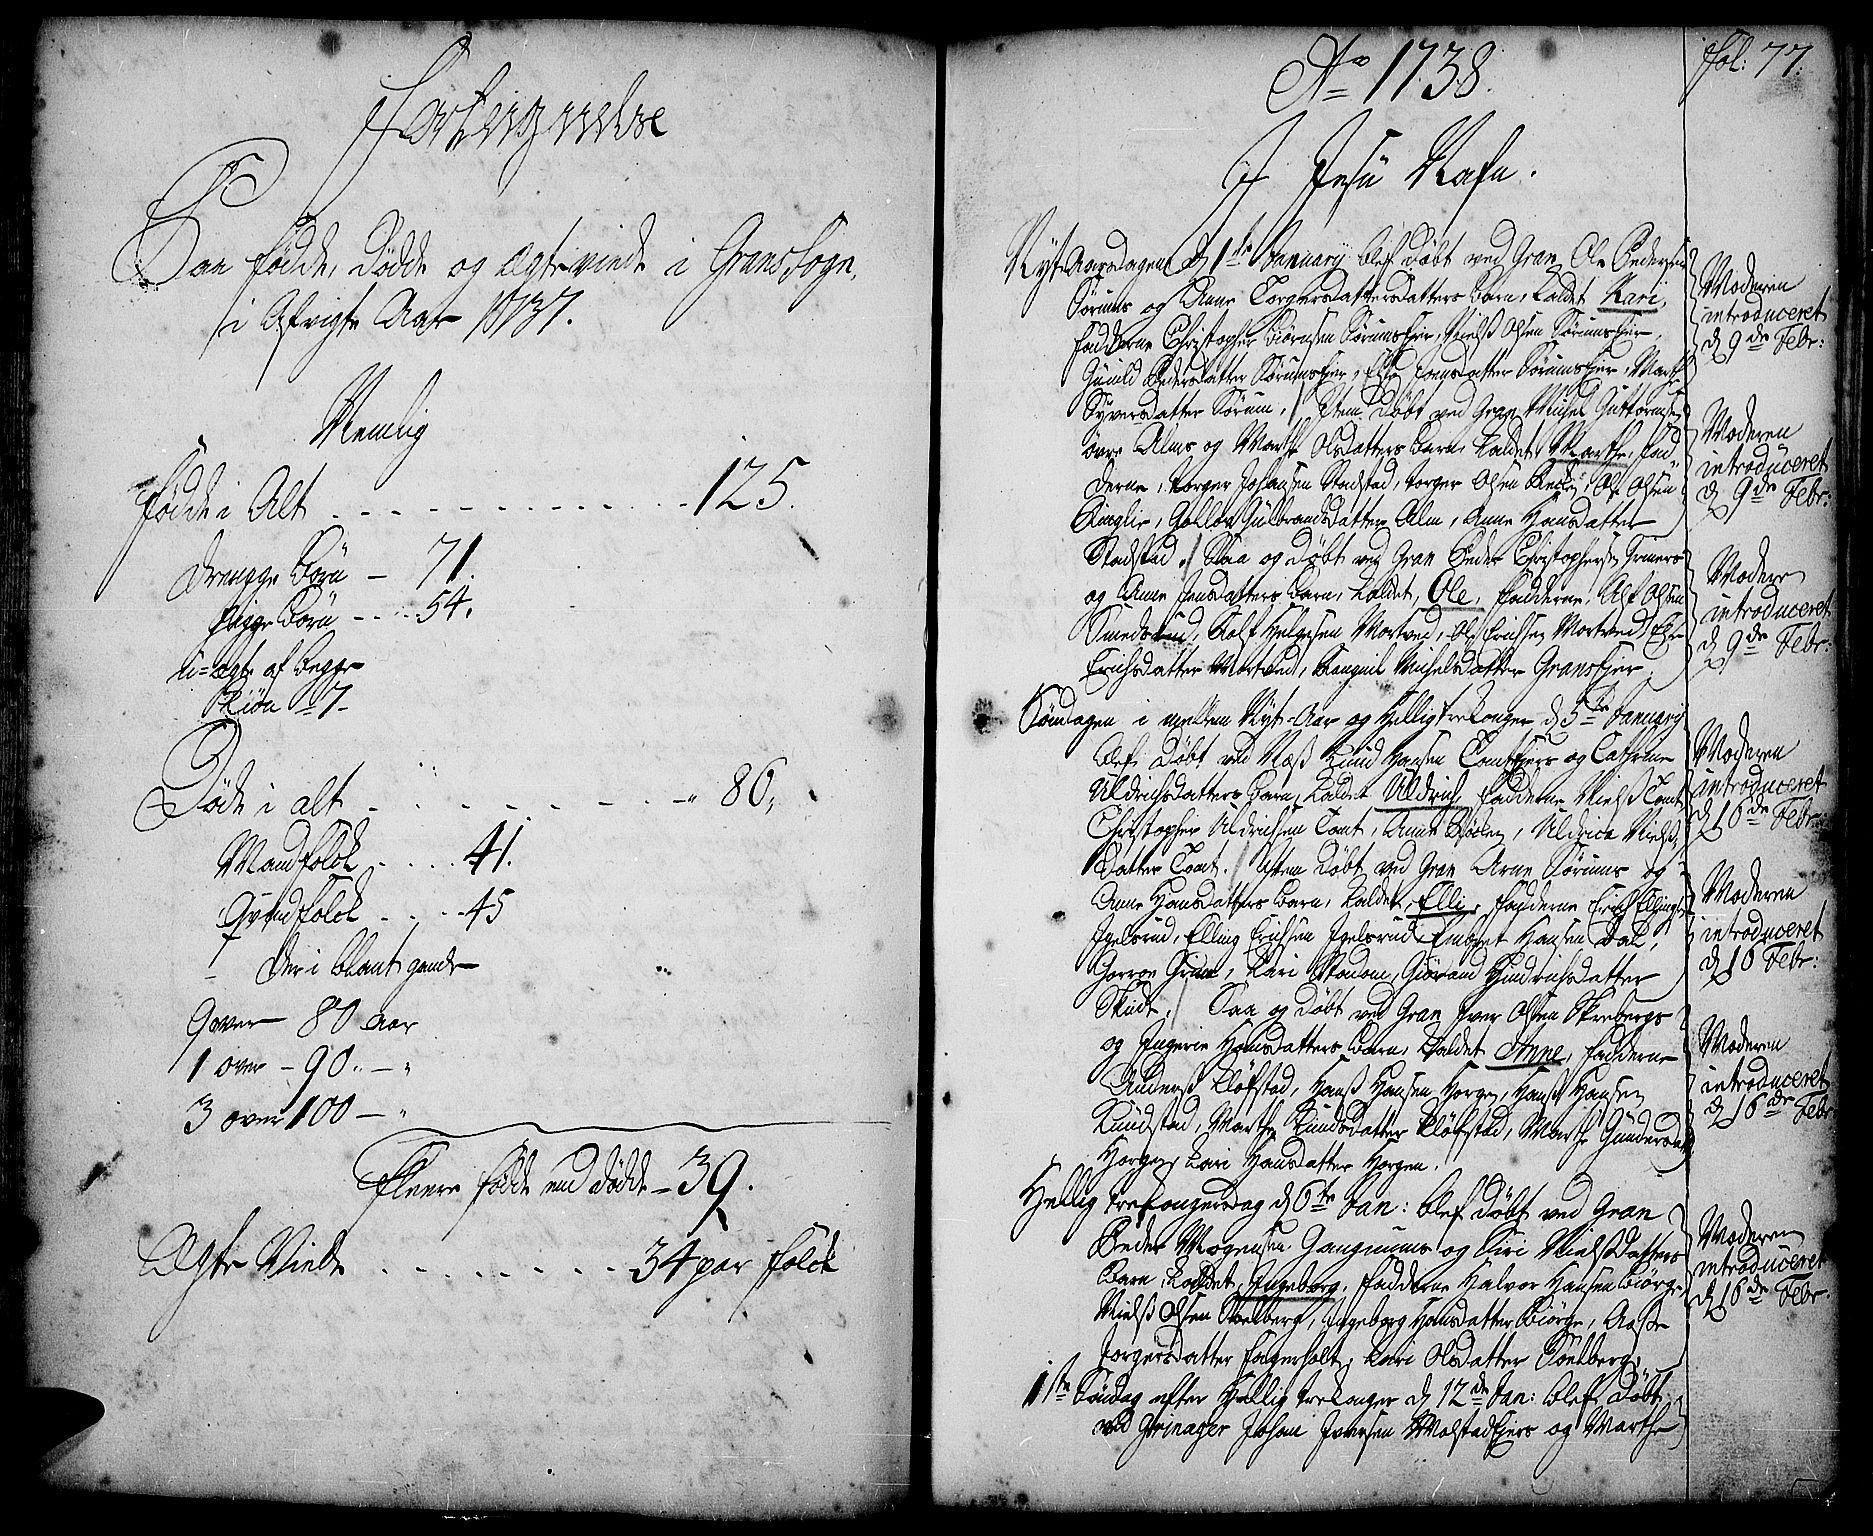 SAH, Gran prestekontor, Ministerialbok nr. 2, 1732-1744, s. 77